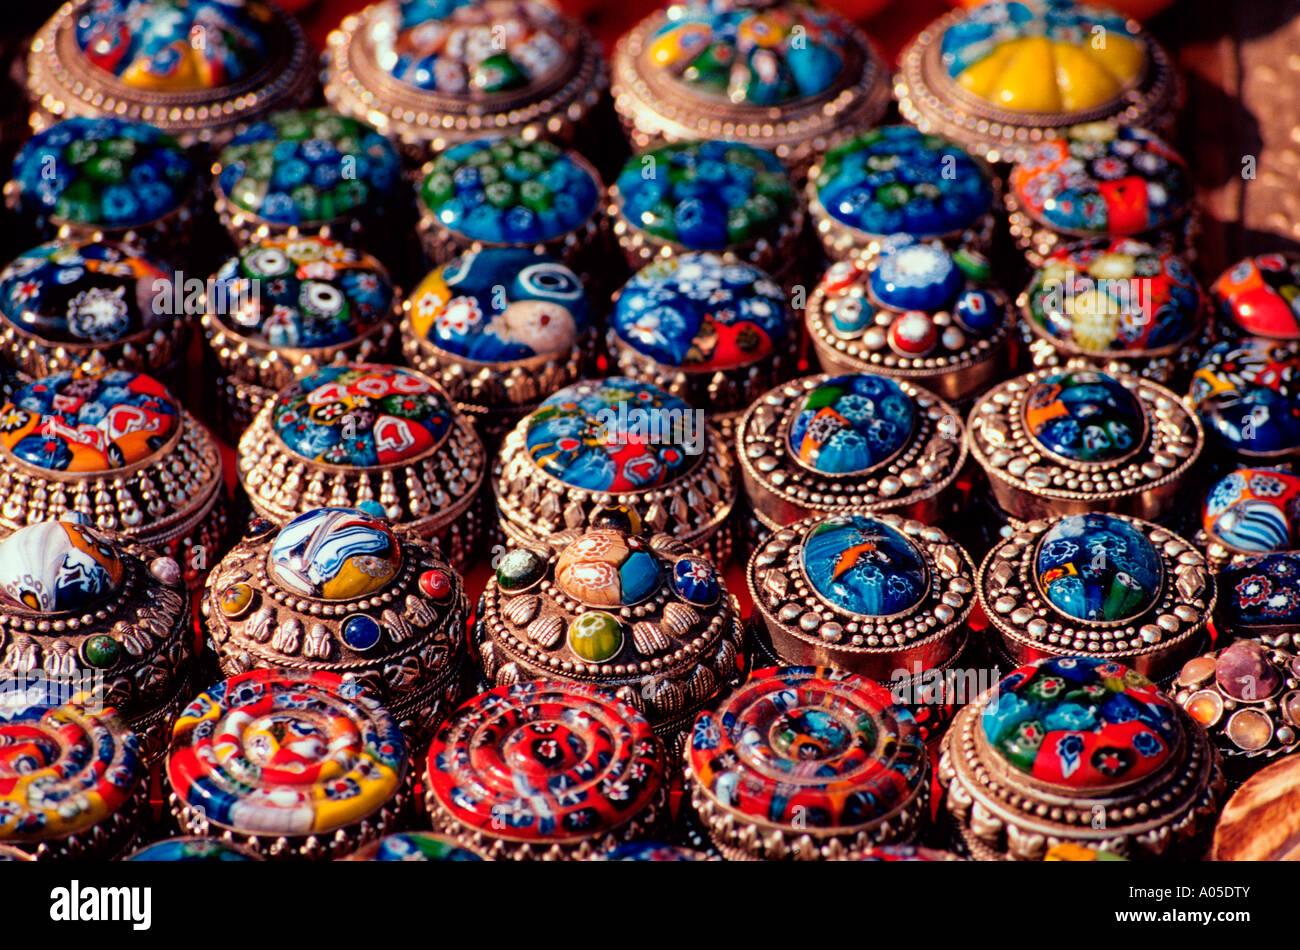 Kathmandu, Handicrafts - Stock Image